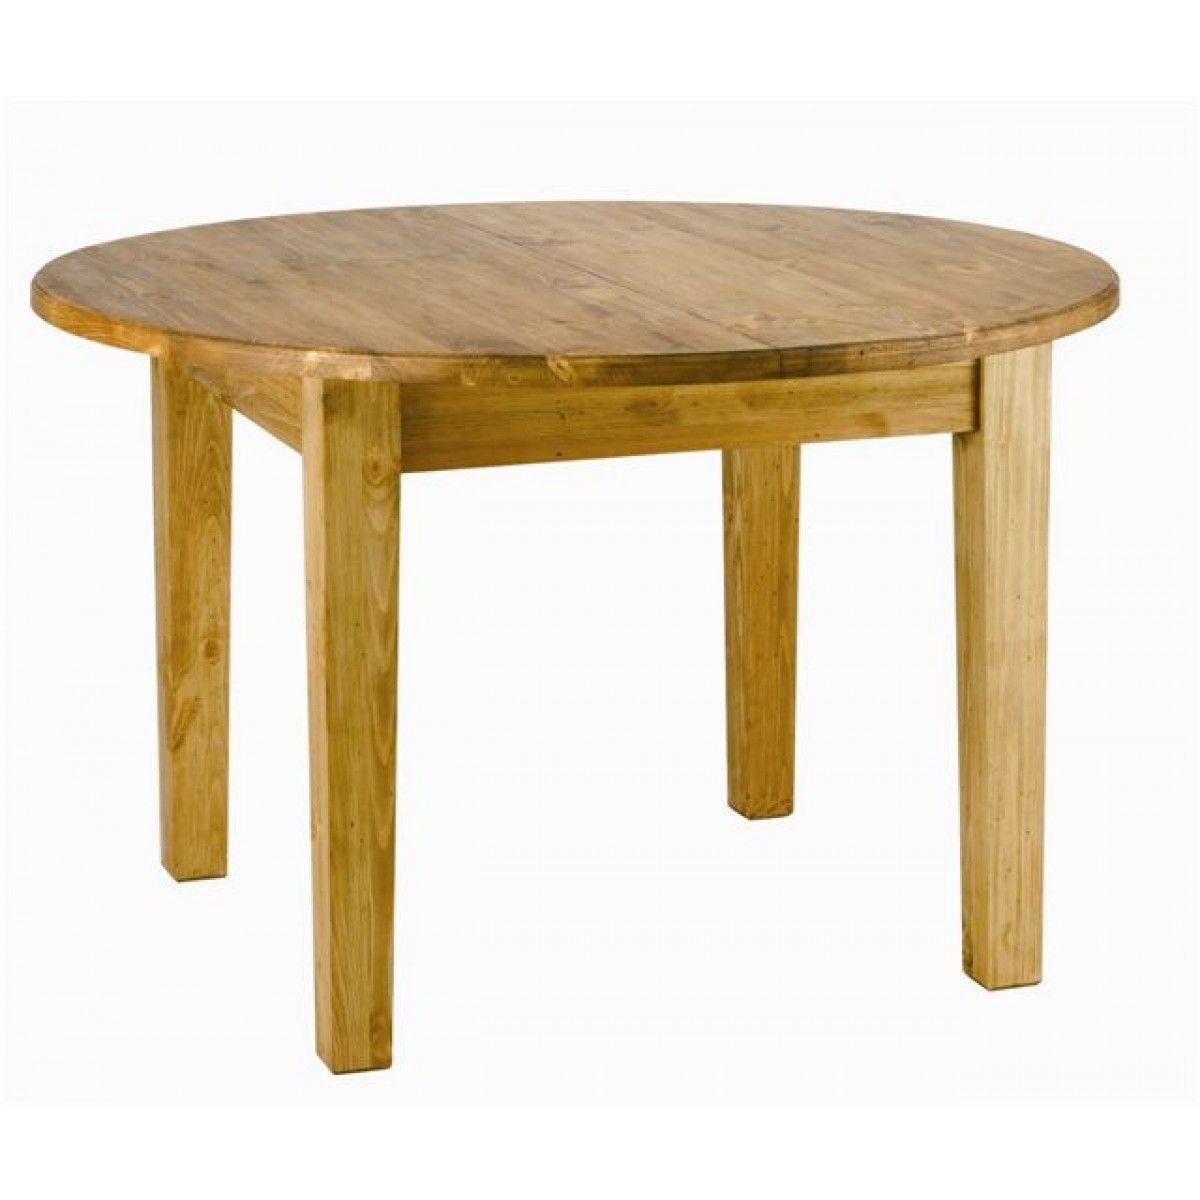 table ronde pin massif extensible 120cm avec rallonge grenier alpin table repas en bois ga. Black Bedroom Furniture Sets. Home Design Ideas